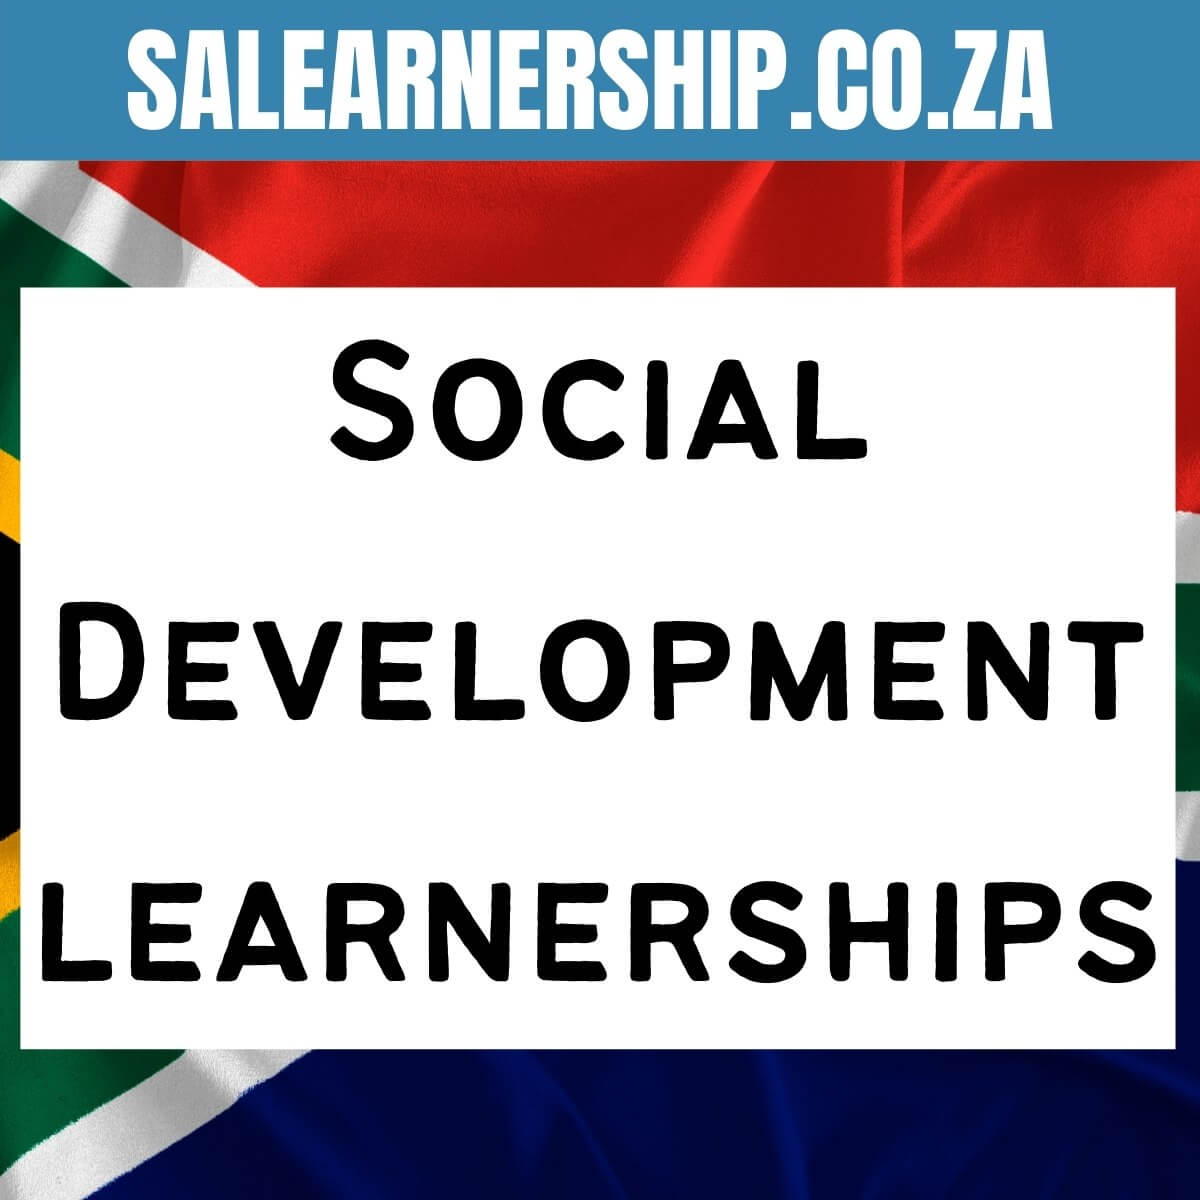 Social Development Learnerships 2021 2022